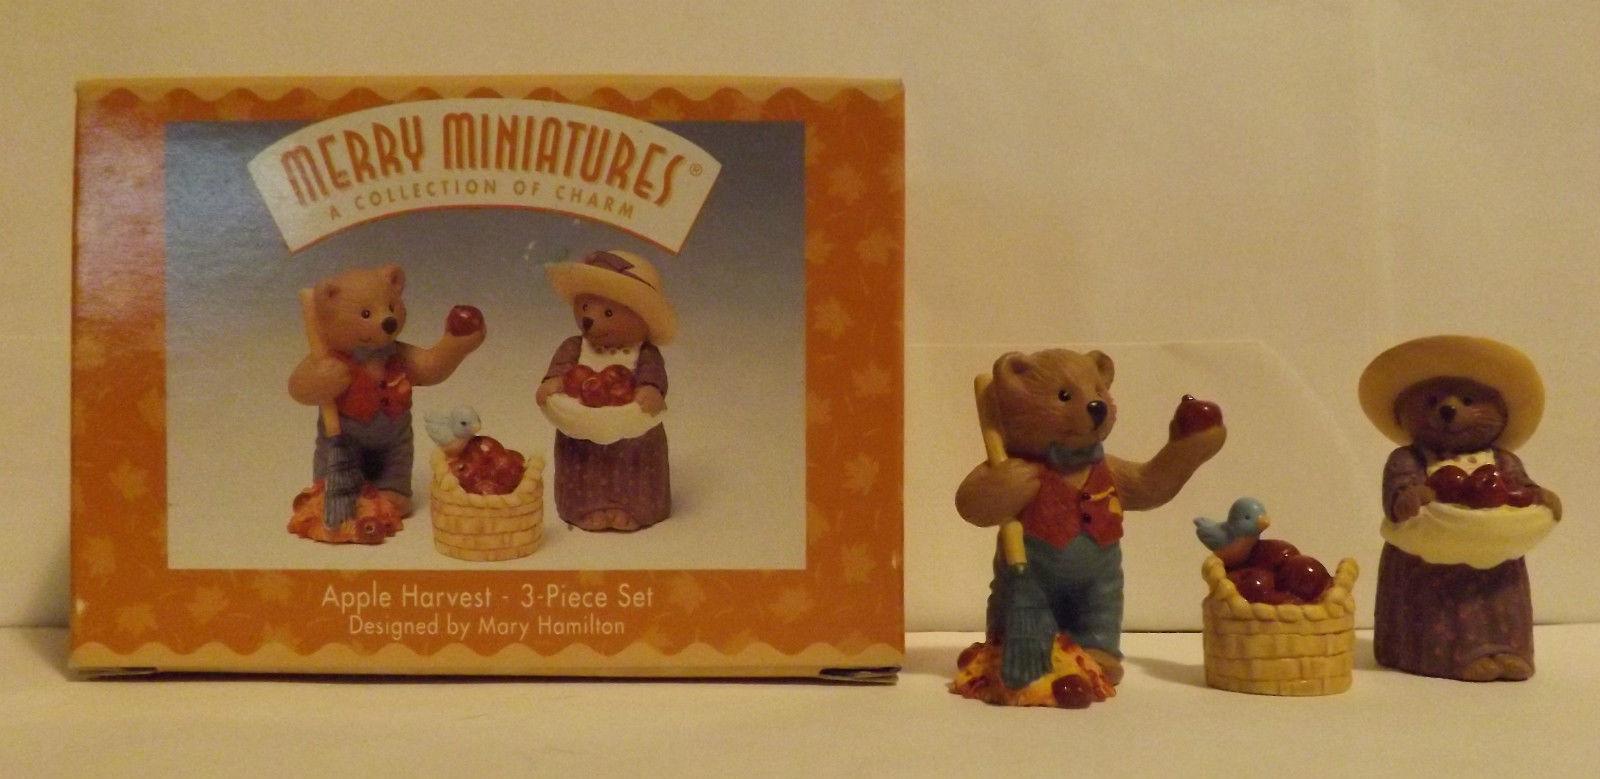 Hallmark Merry Miniatures Apple Harvest 3-Piece Set 1997